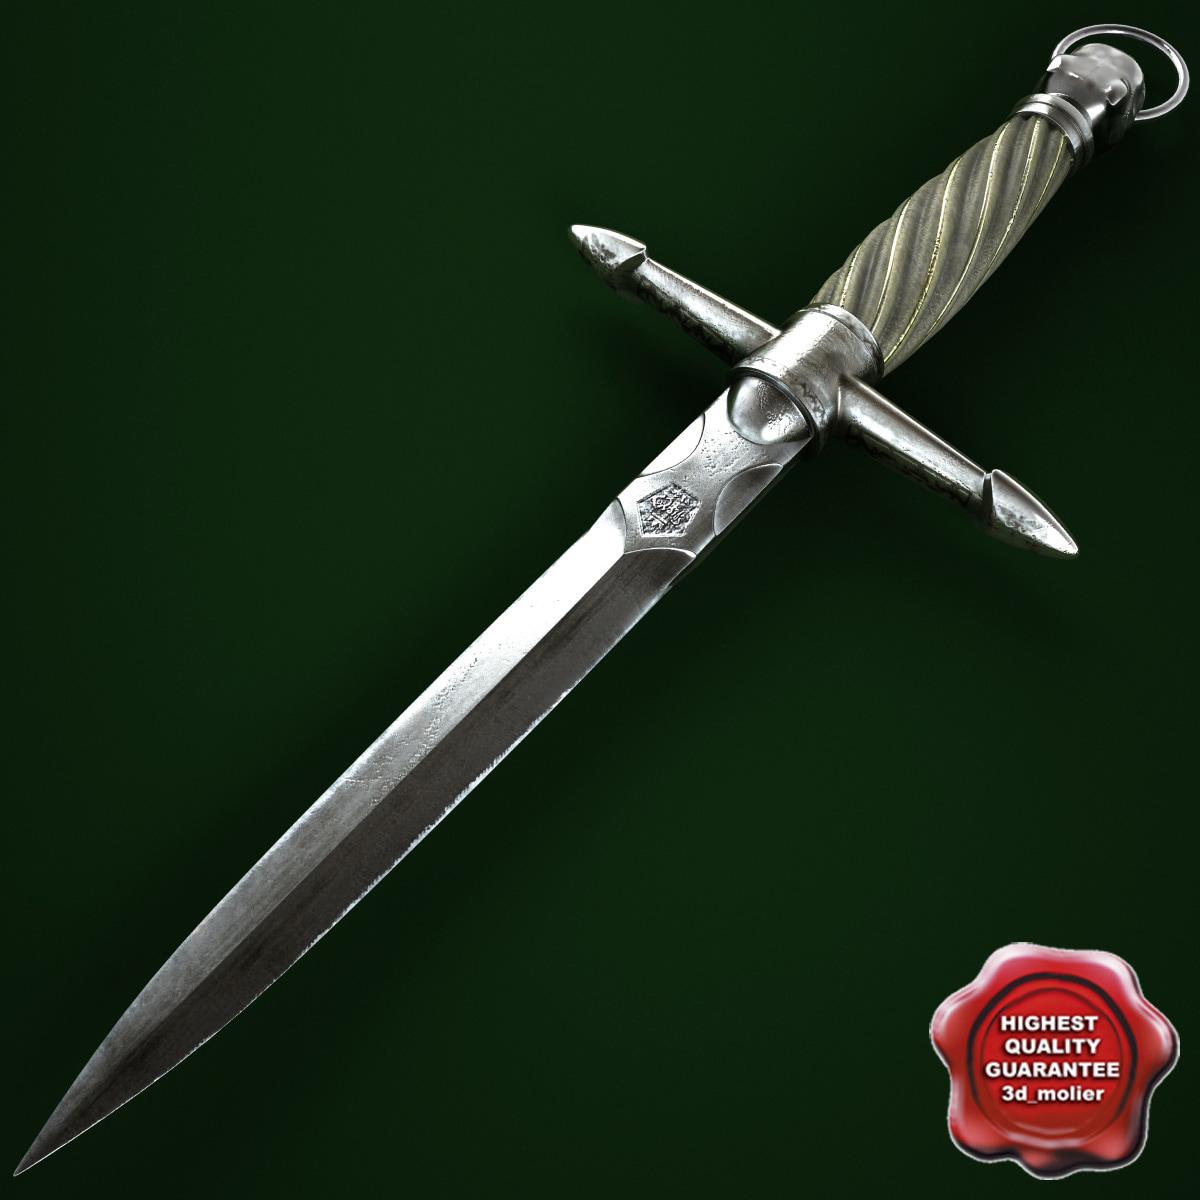 3ds max dagger modelled